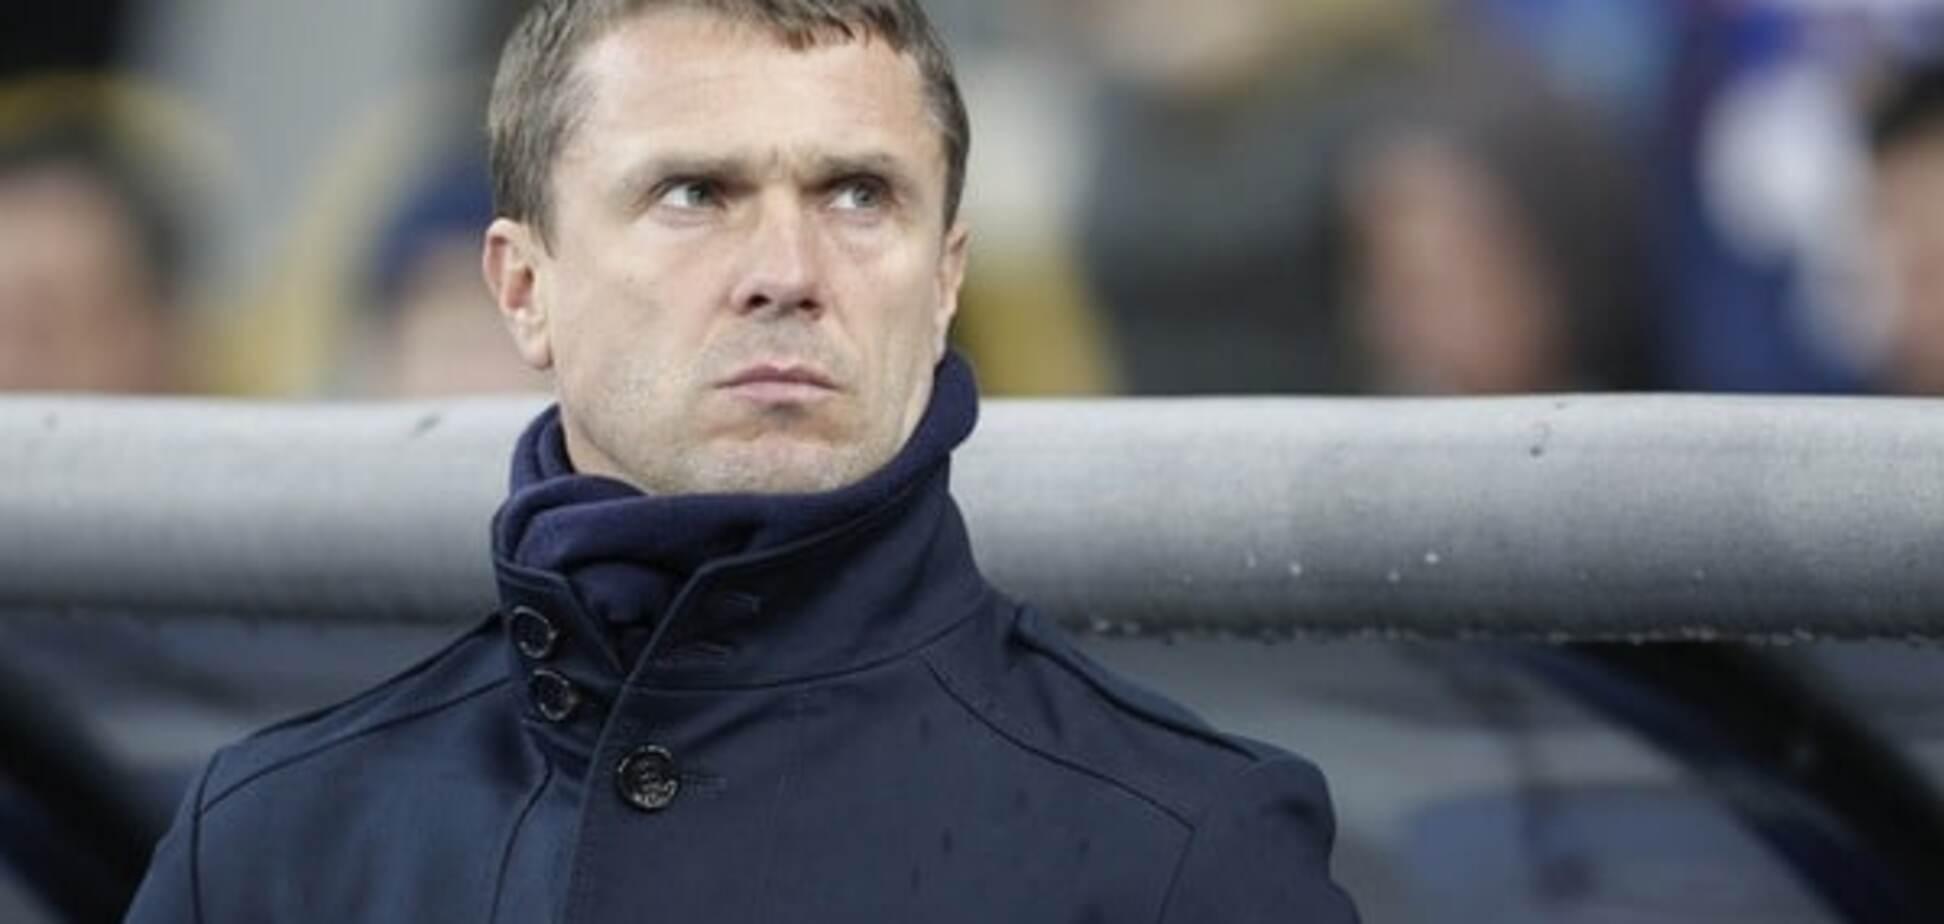 Ребров резко раскритиковал лидера 'Динамо' за матч с 'Манчестер Сити'